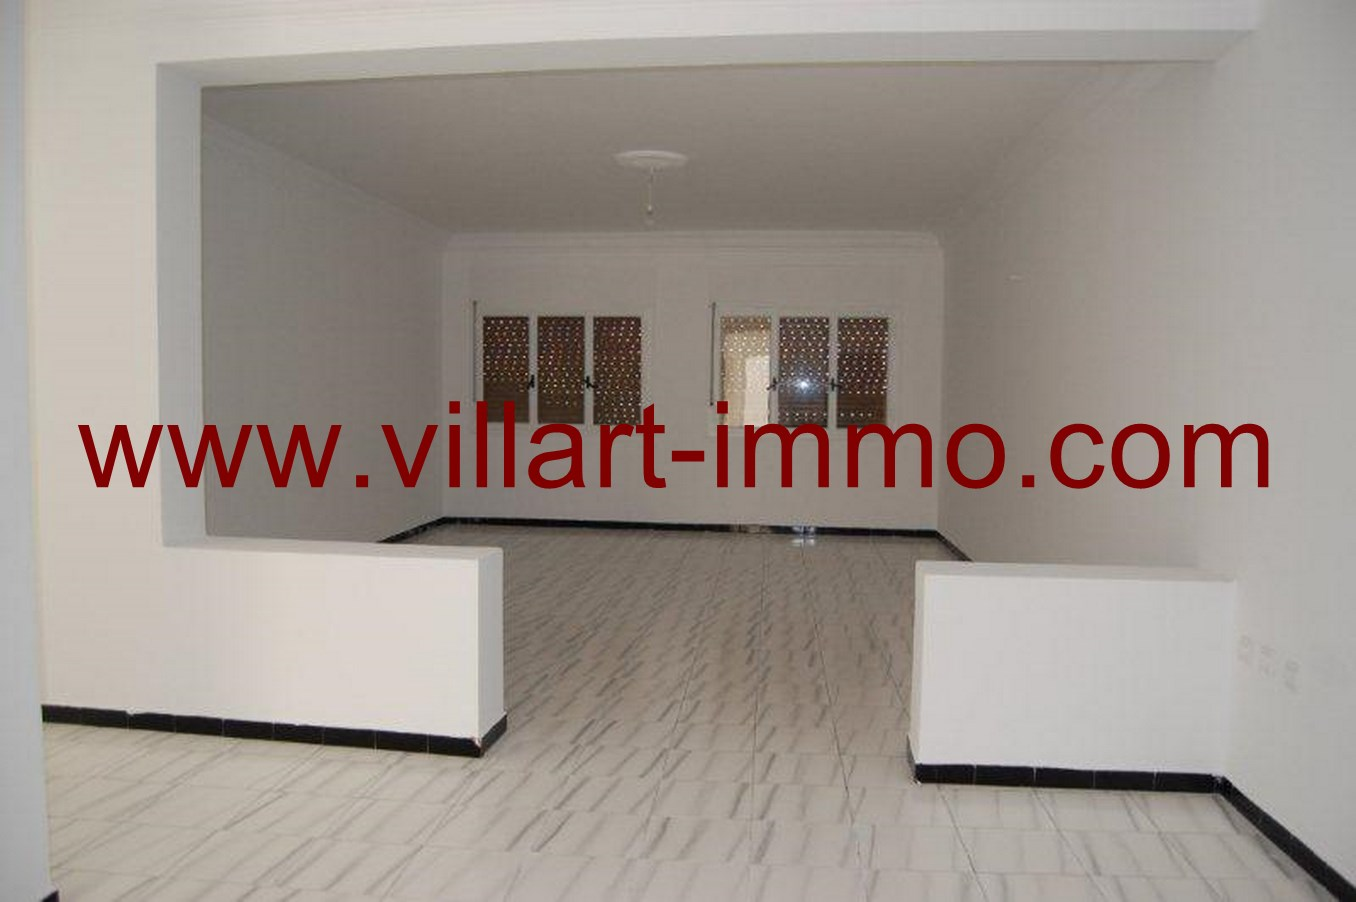 3-Location-Appartement-non meublé-Tanger-salon-L615-Villart-immo